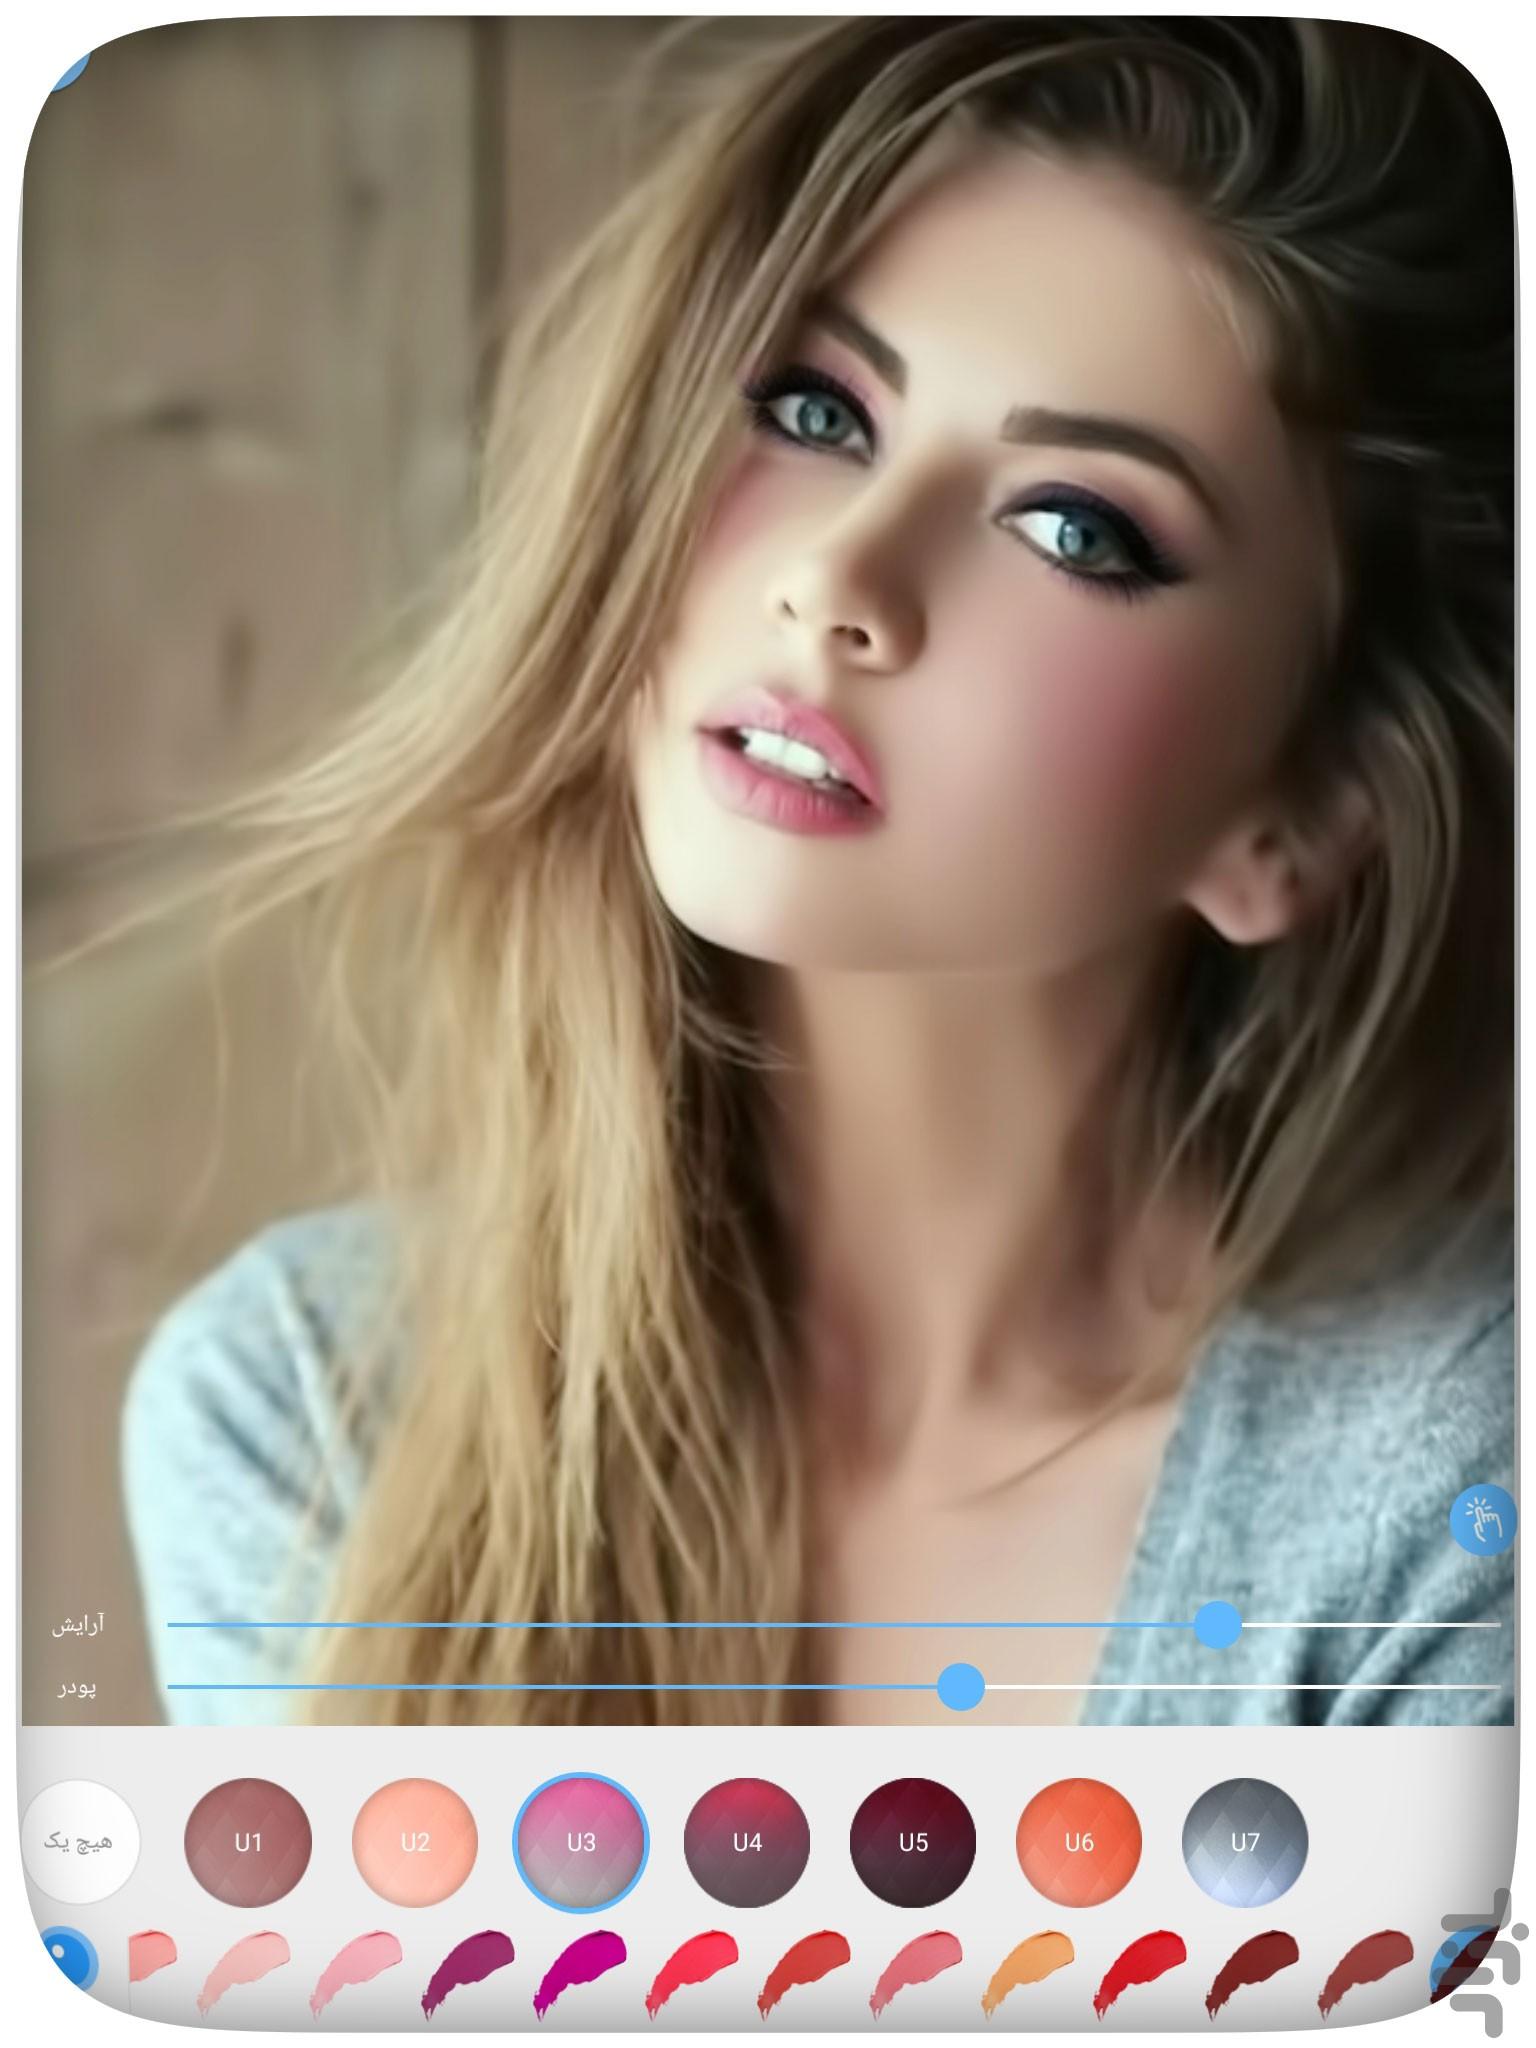 آرایش چهره for Android - Download | Cafe Bazaar